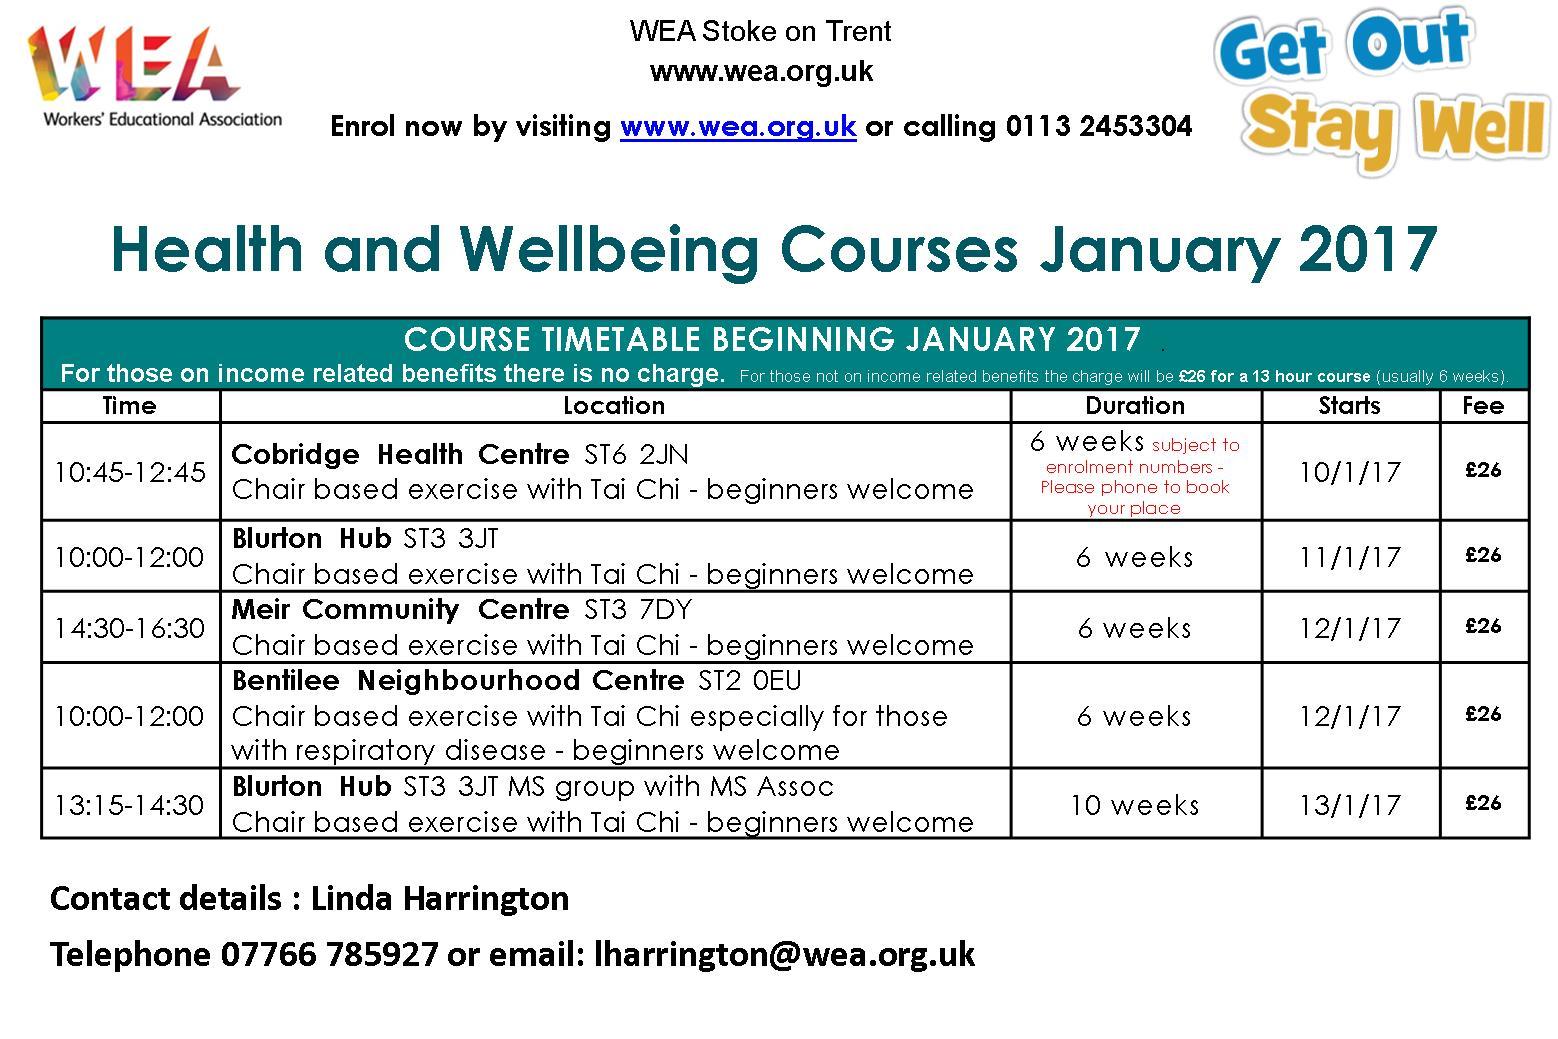 Health & Wellbing courses January 2017